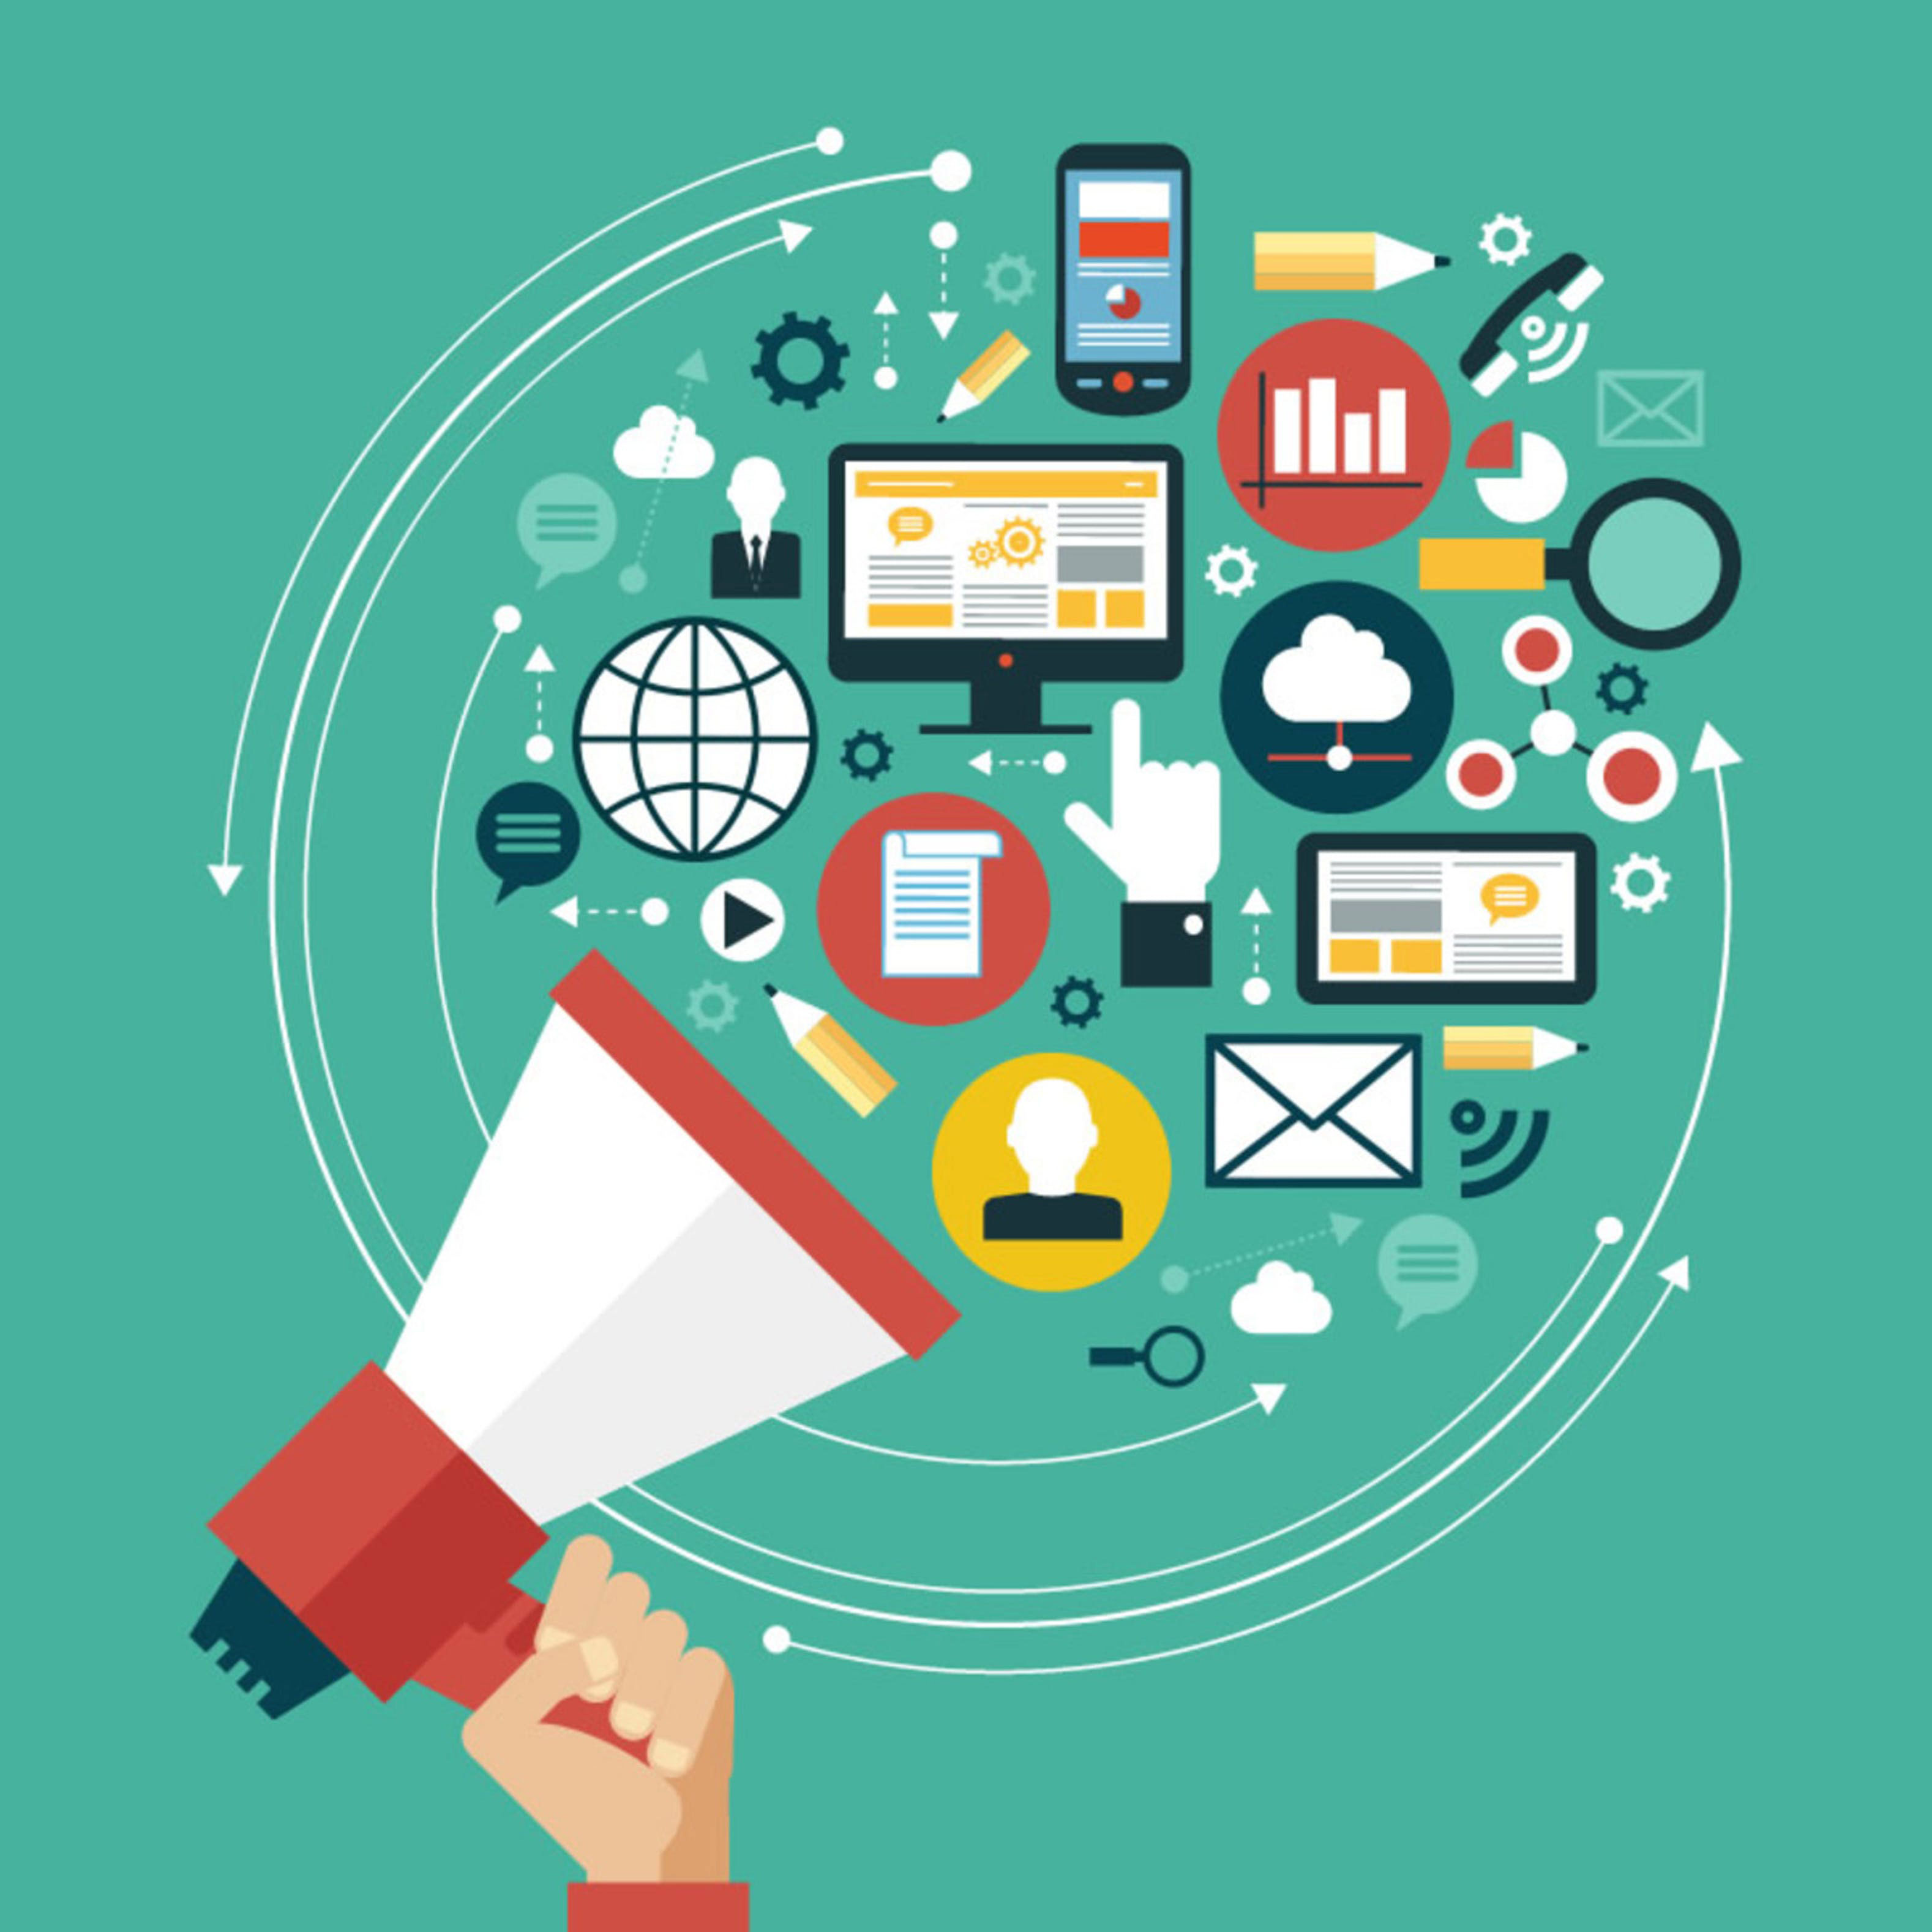 Advertising - مکان های مناسب تبلیغات و طراحی آگهی